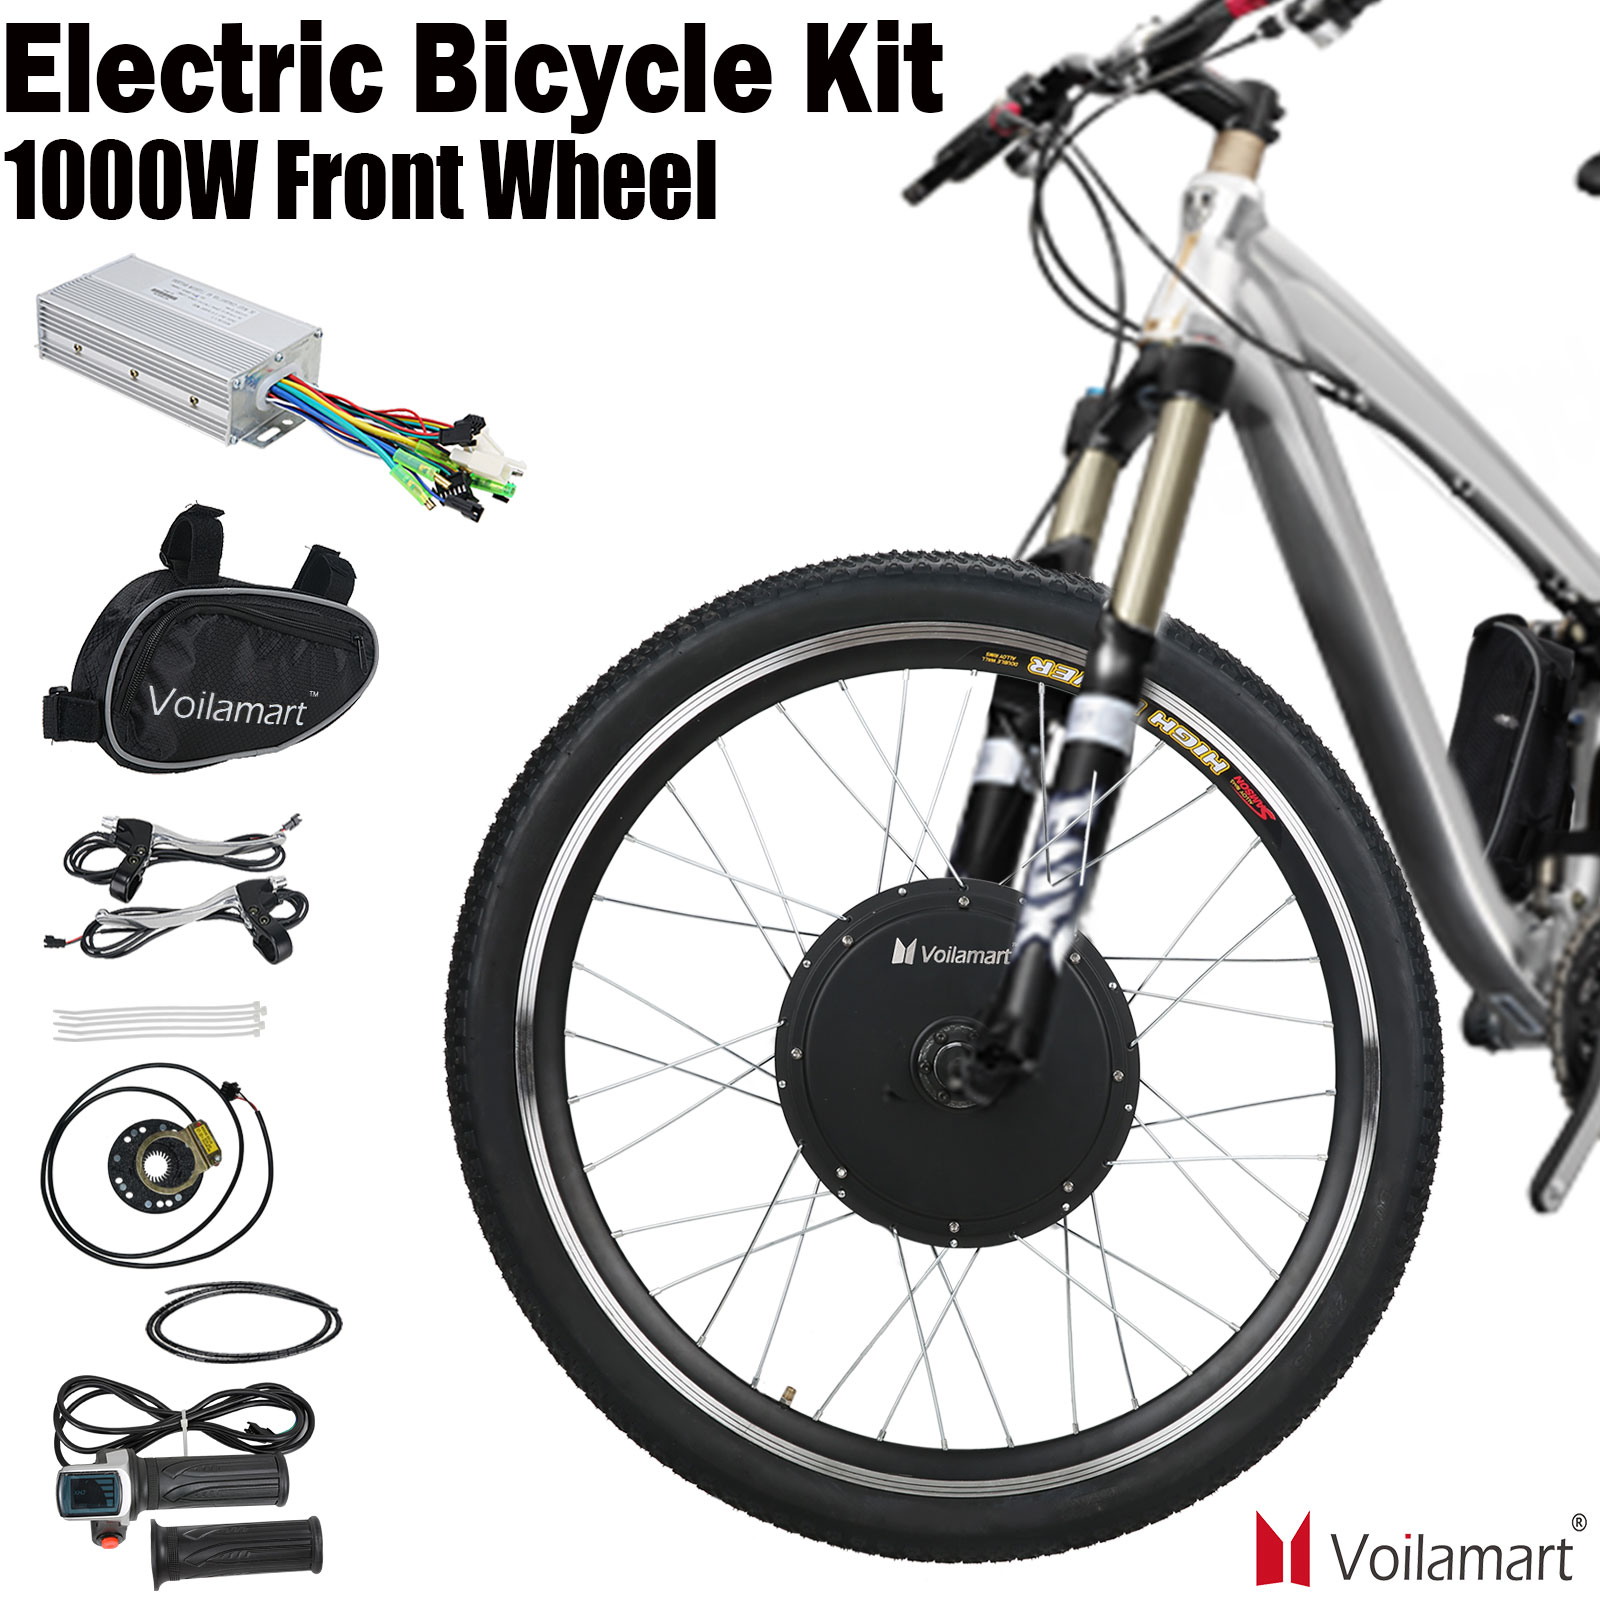 Voilamart 26 بوصة 48 فولت 1000 واط مجموعة تحويل الدراجة العاديّة إلى كهربائيّة بدون فرش بدون تروس محرك أمامي عجلة E دراجة دراجة محور محرك